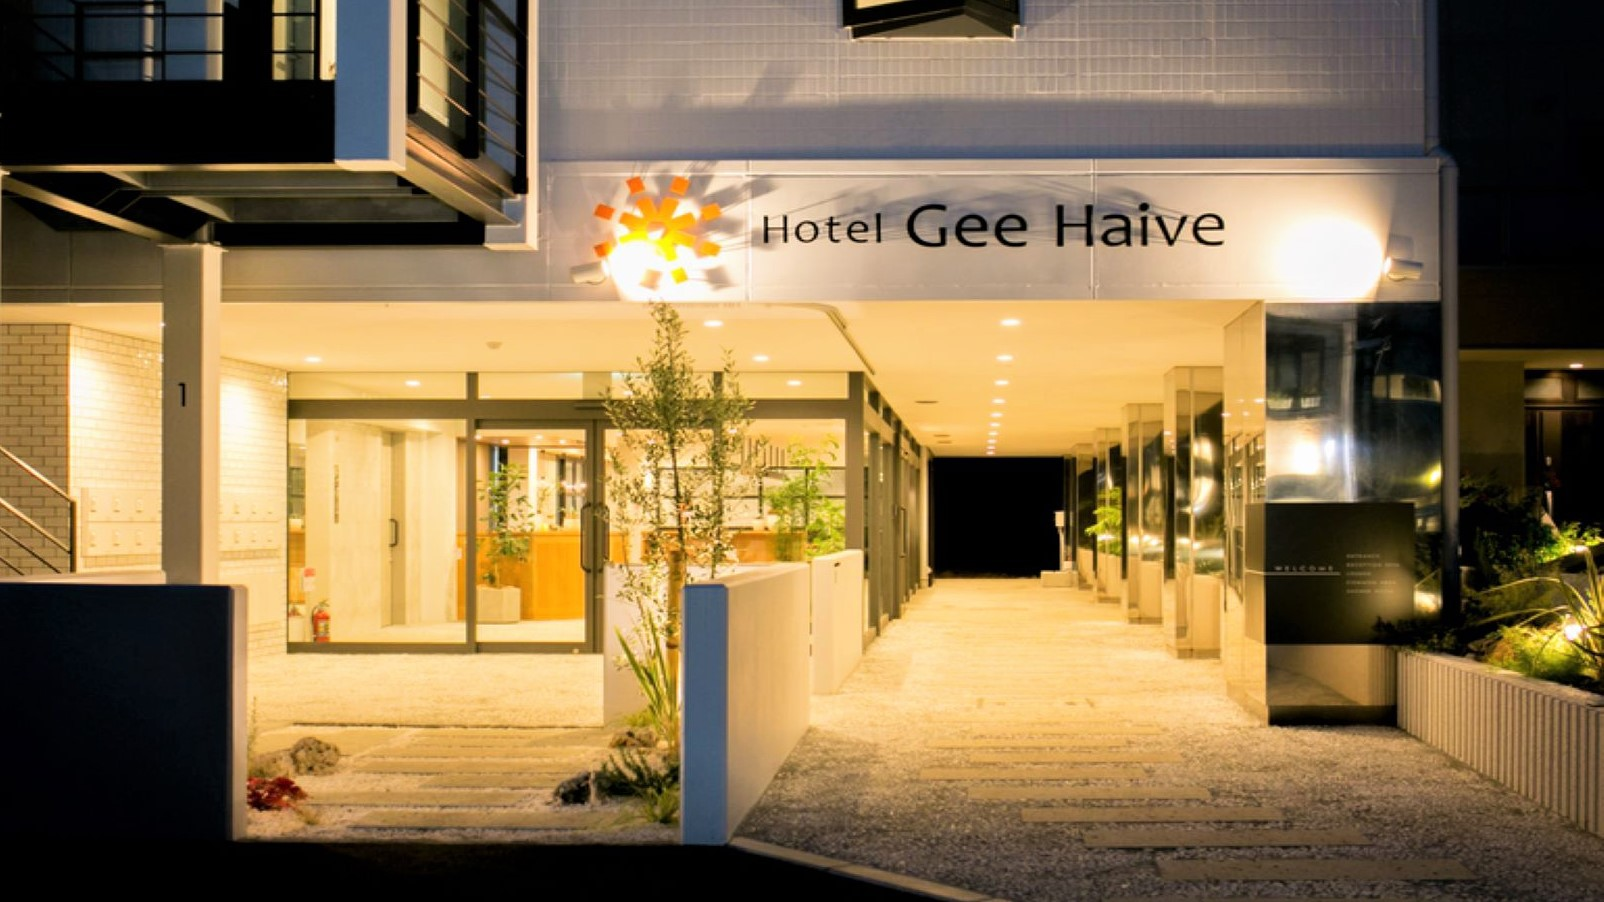 Hotel Gee Haive(ホテル ジー ハイブ)(2018年9月8日グランドオープン) 外観写真